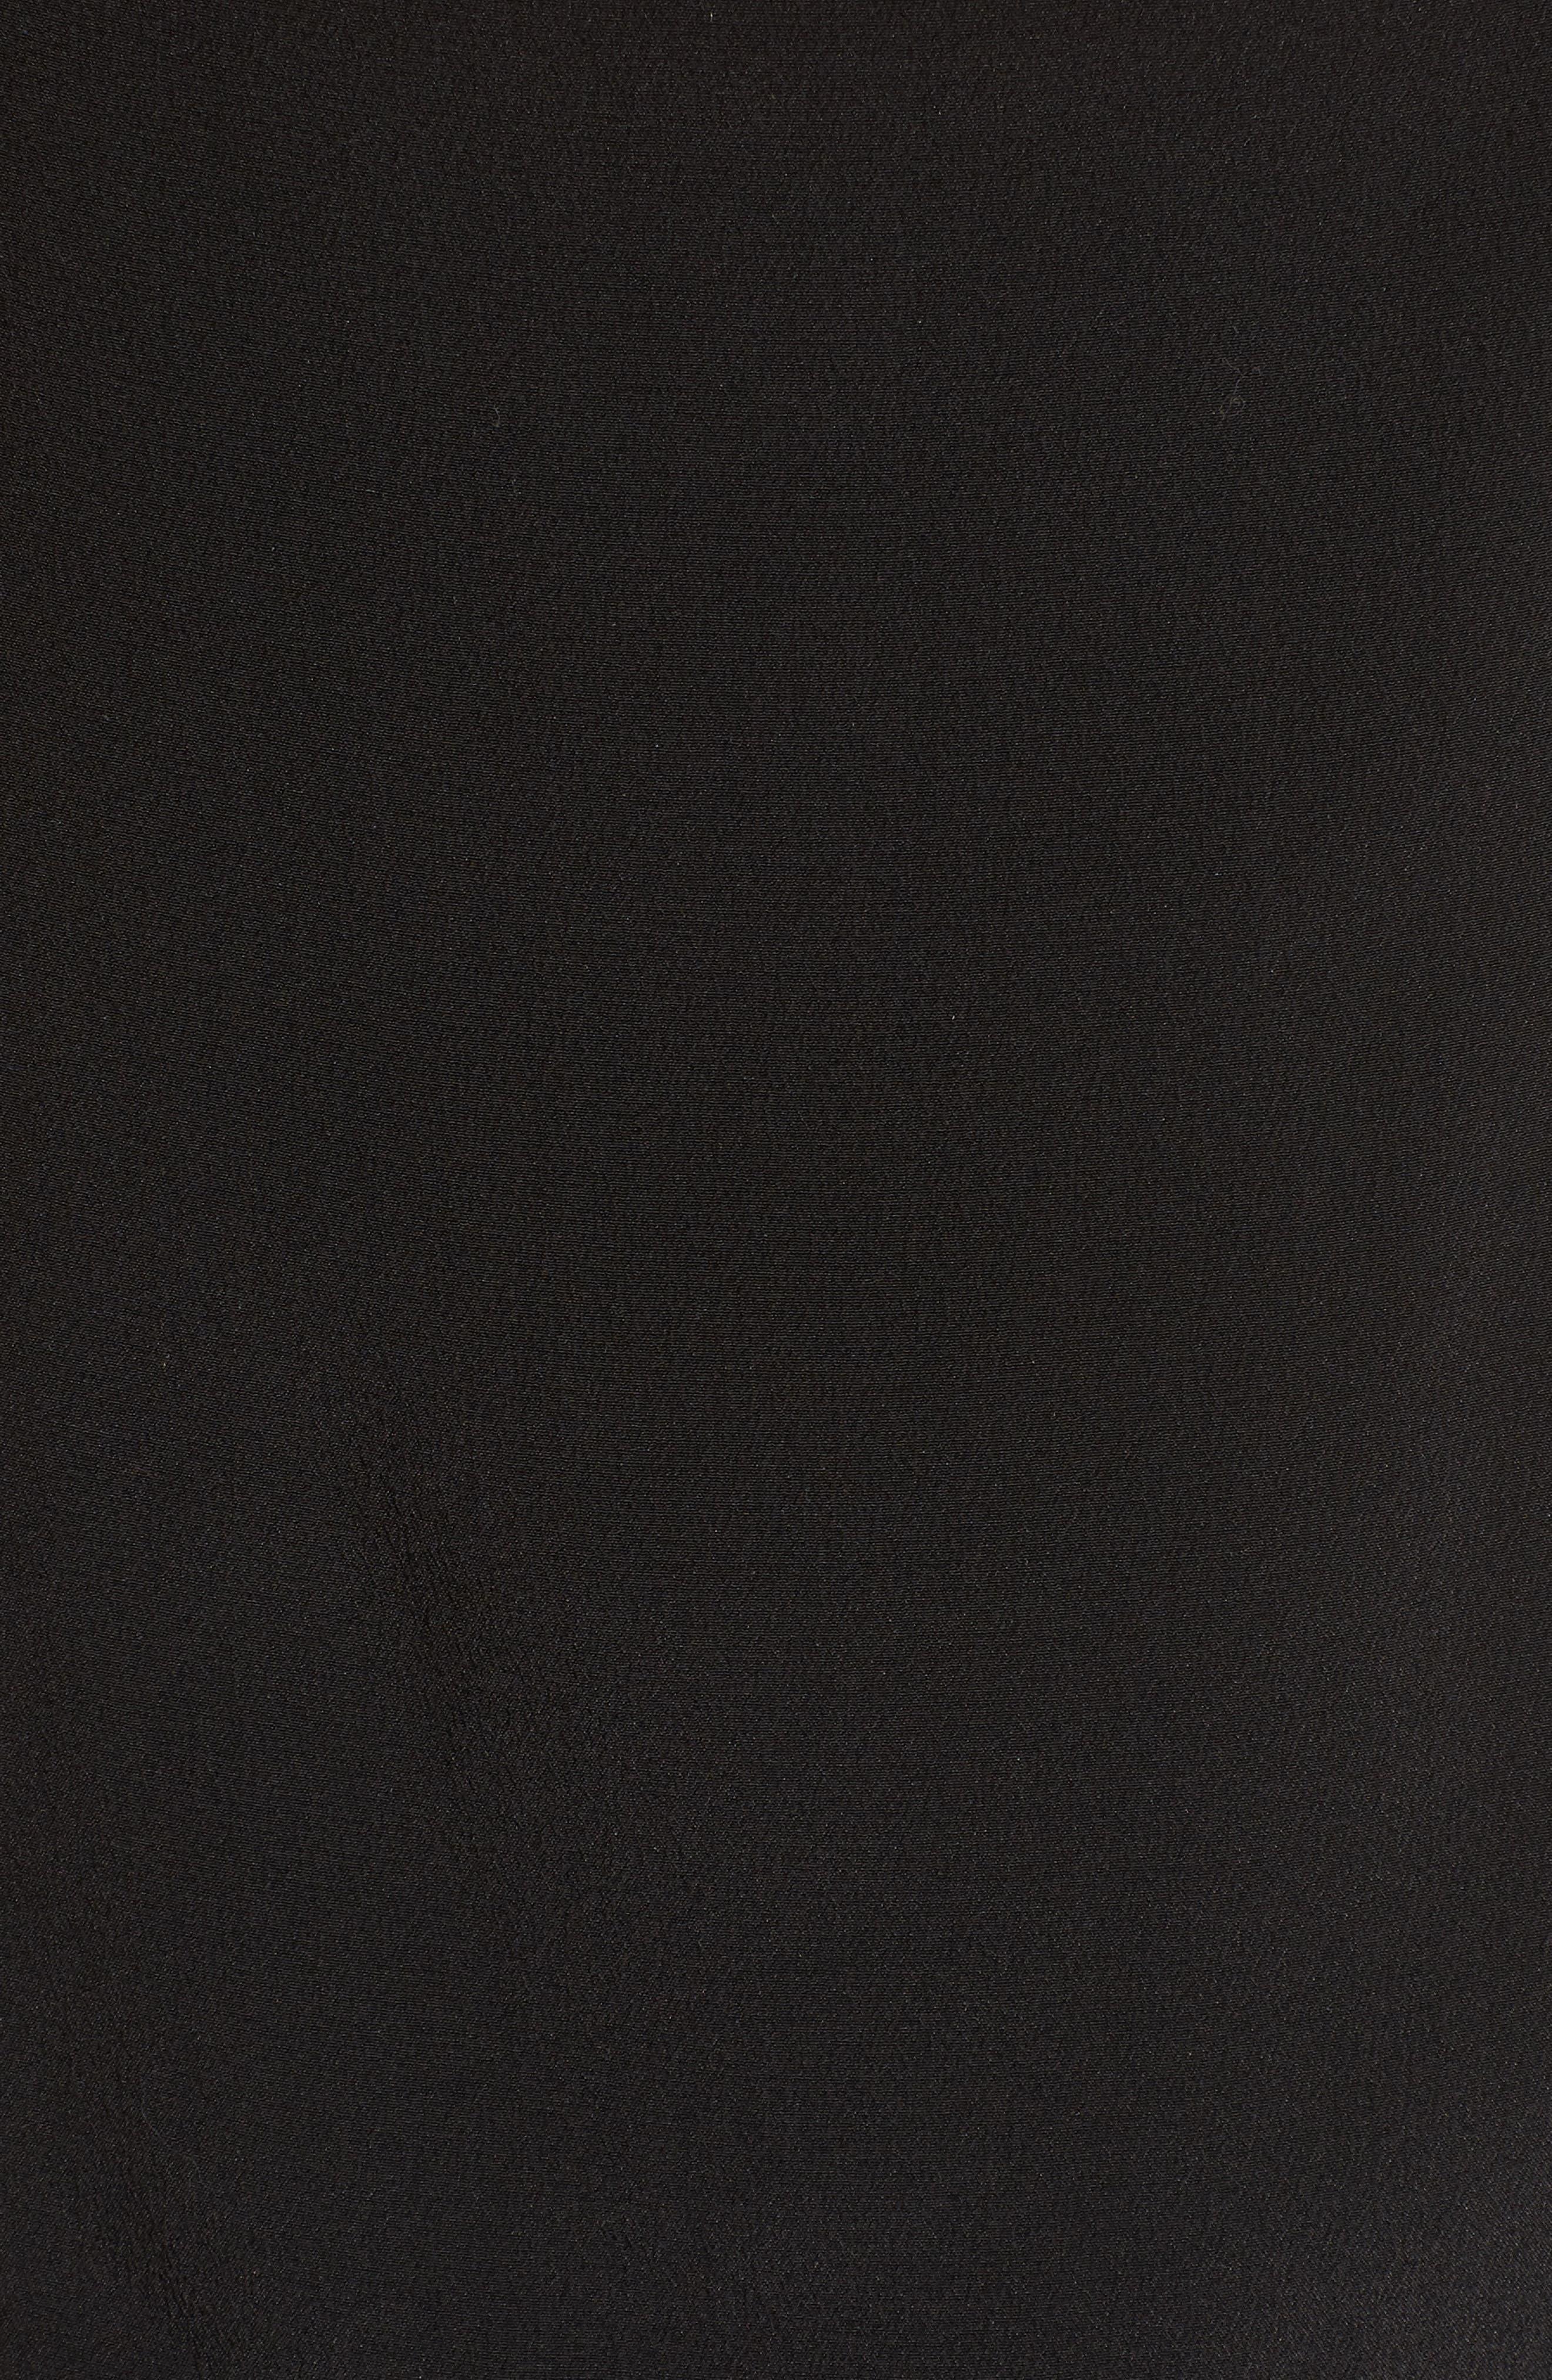 Aubrey V-Neck Camisole,                             Alternate thumbnail 5, color,                             BLACK